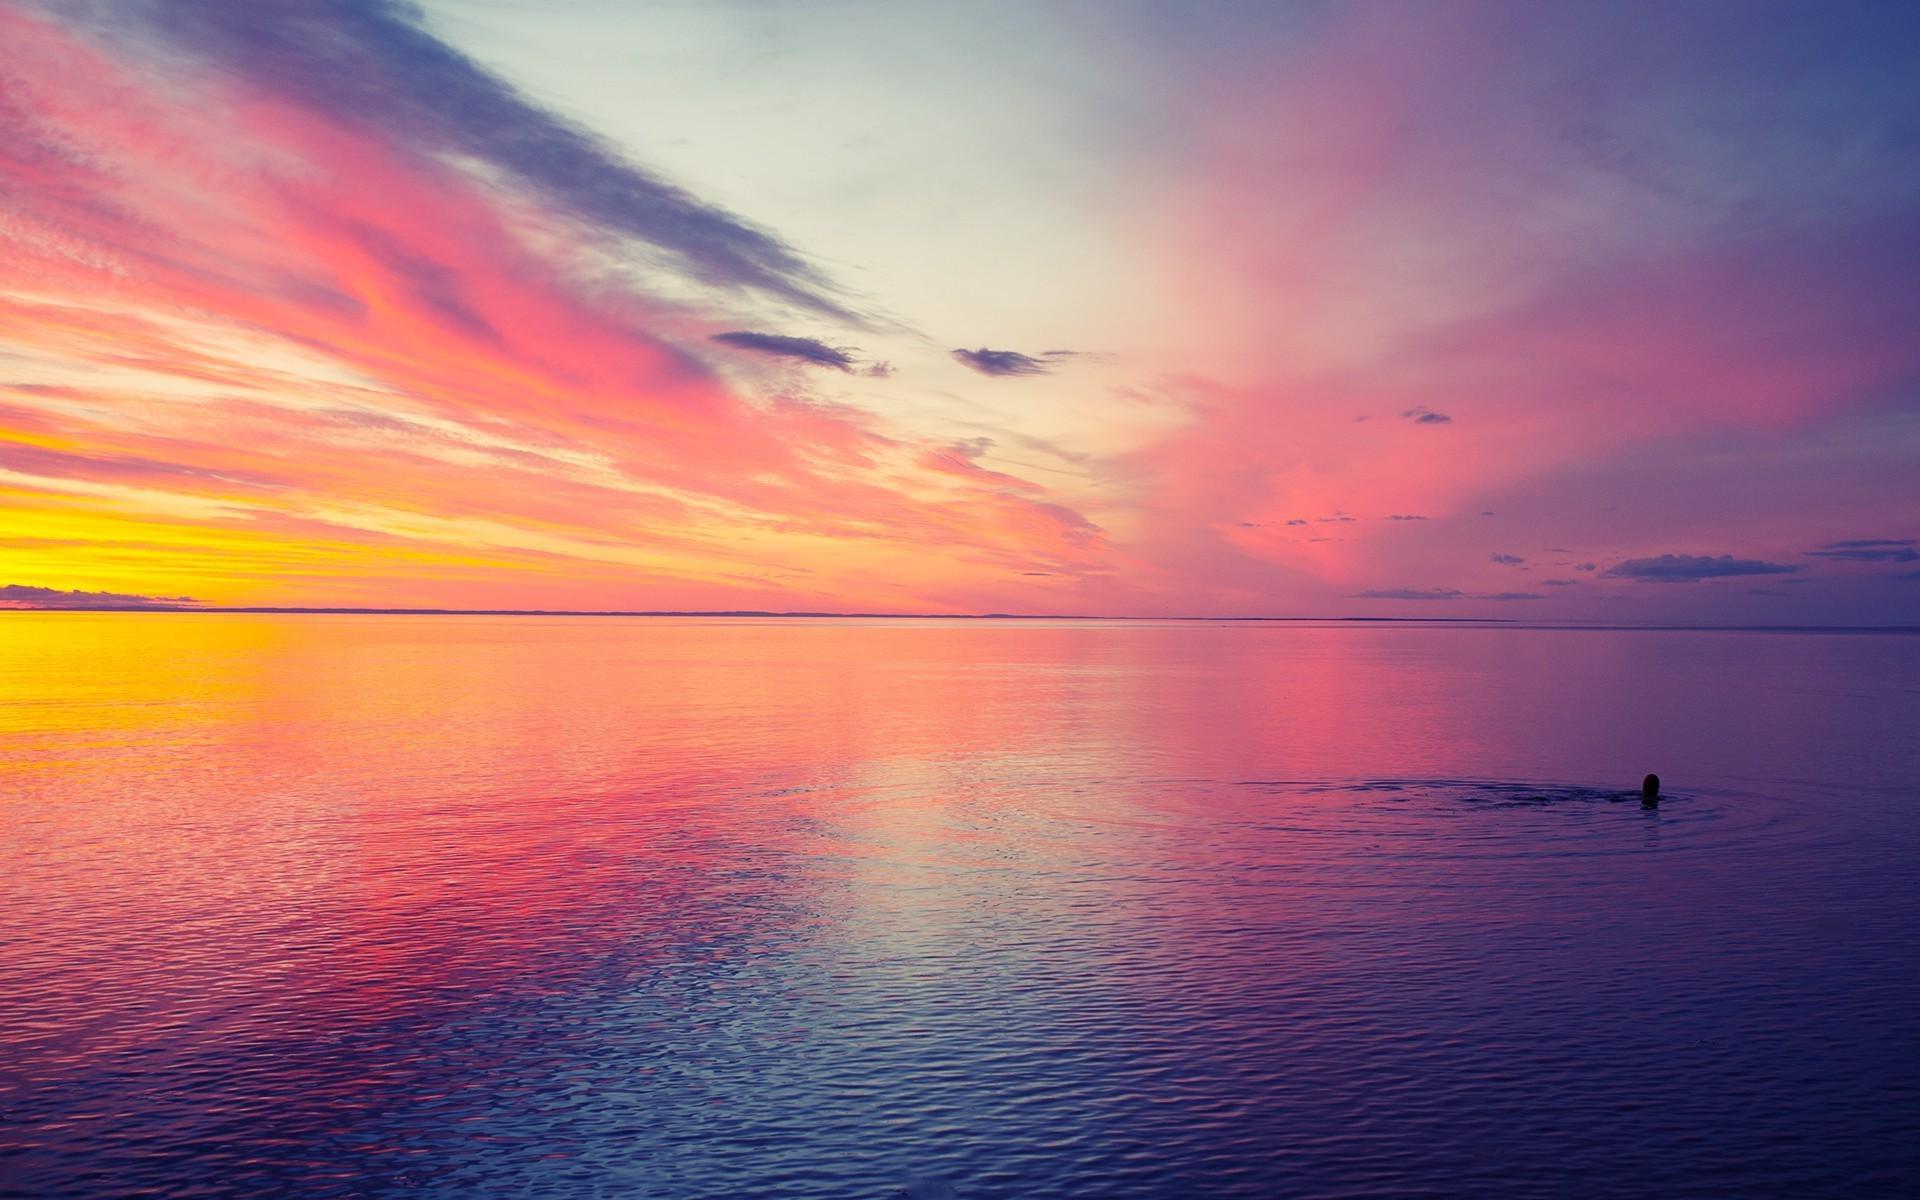 баренцевом разноцветное море картинки очень